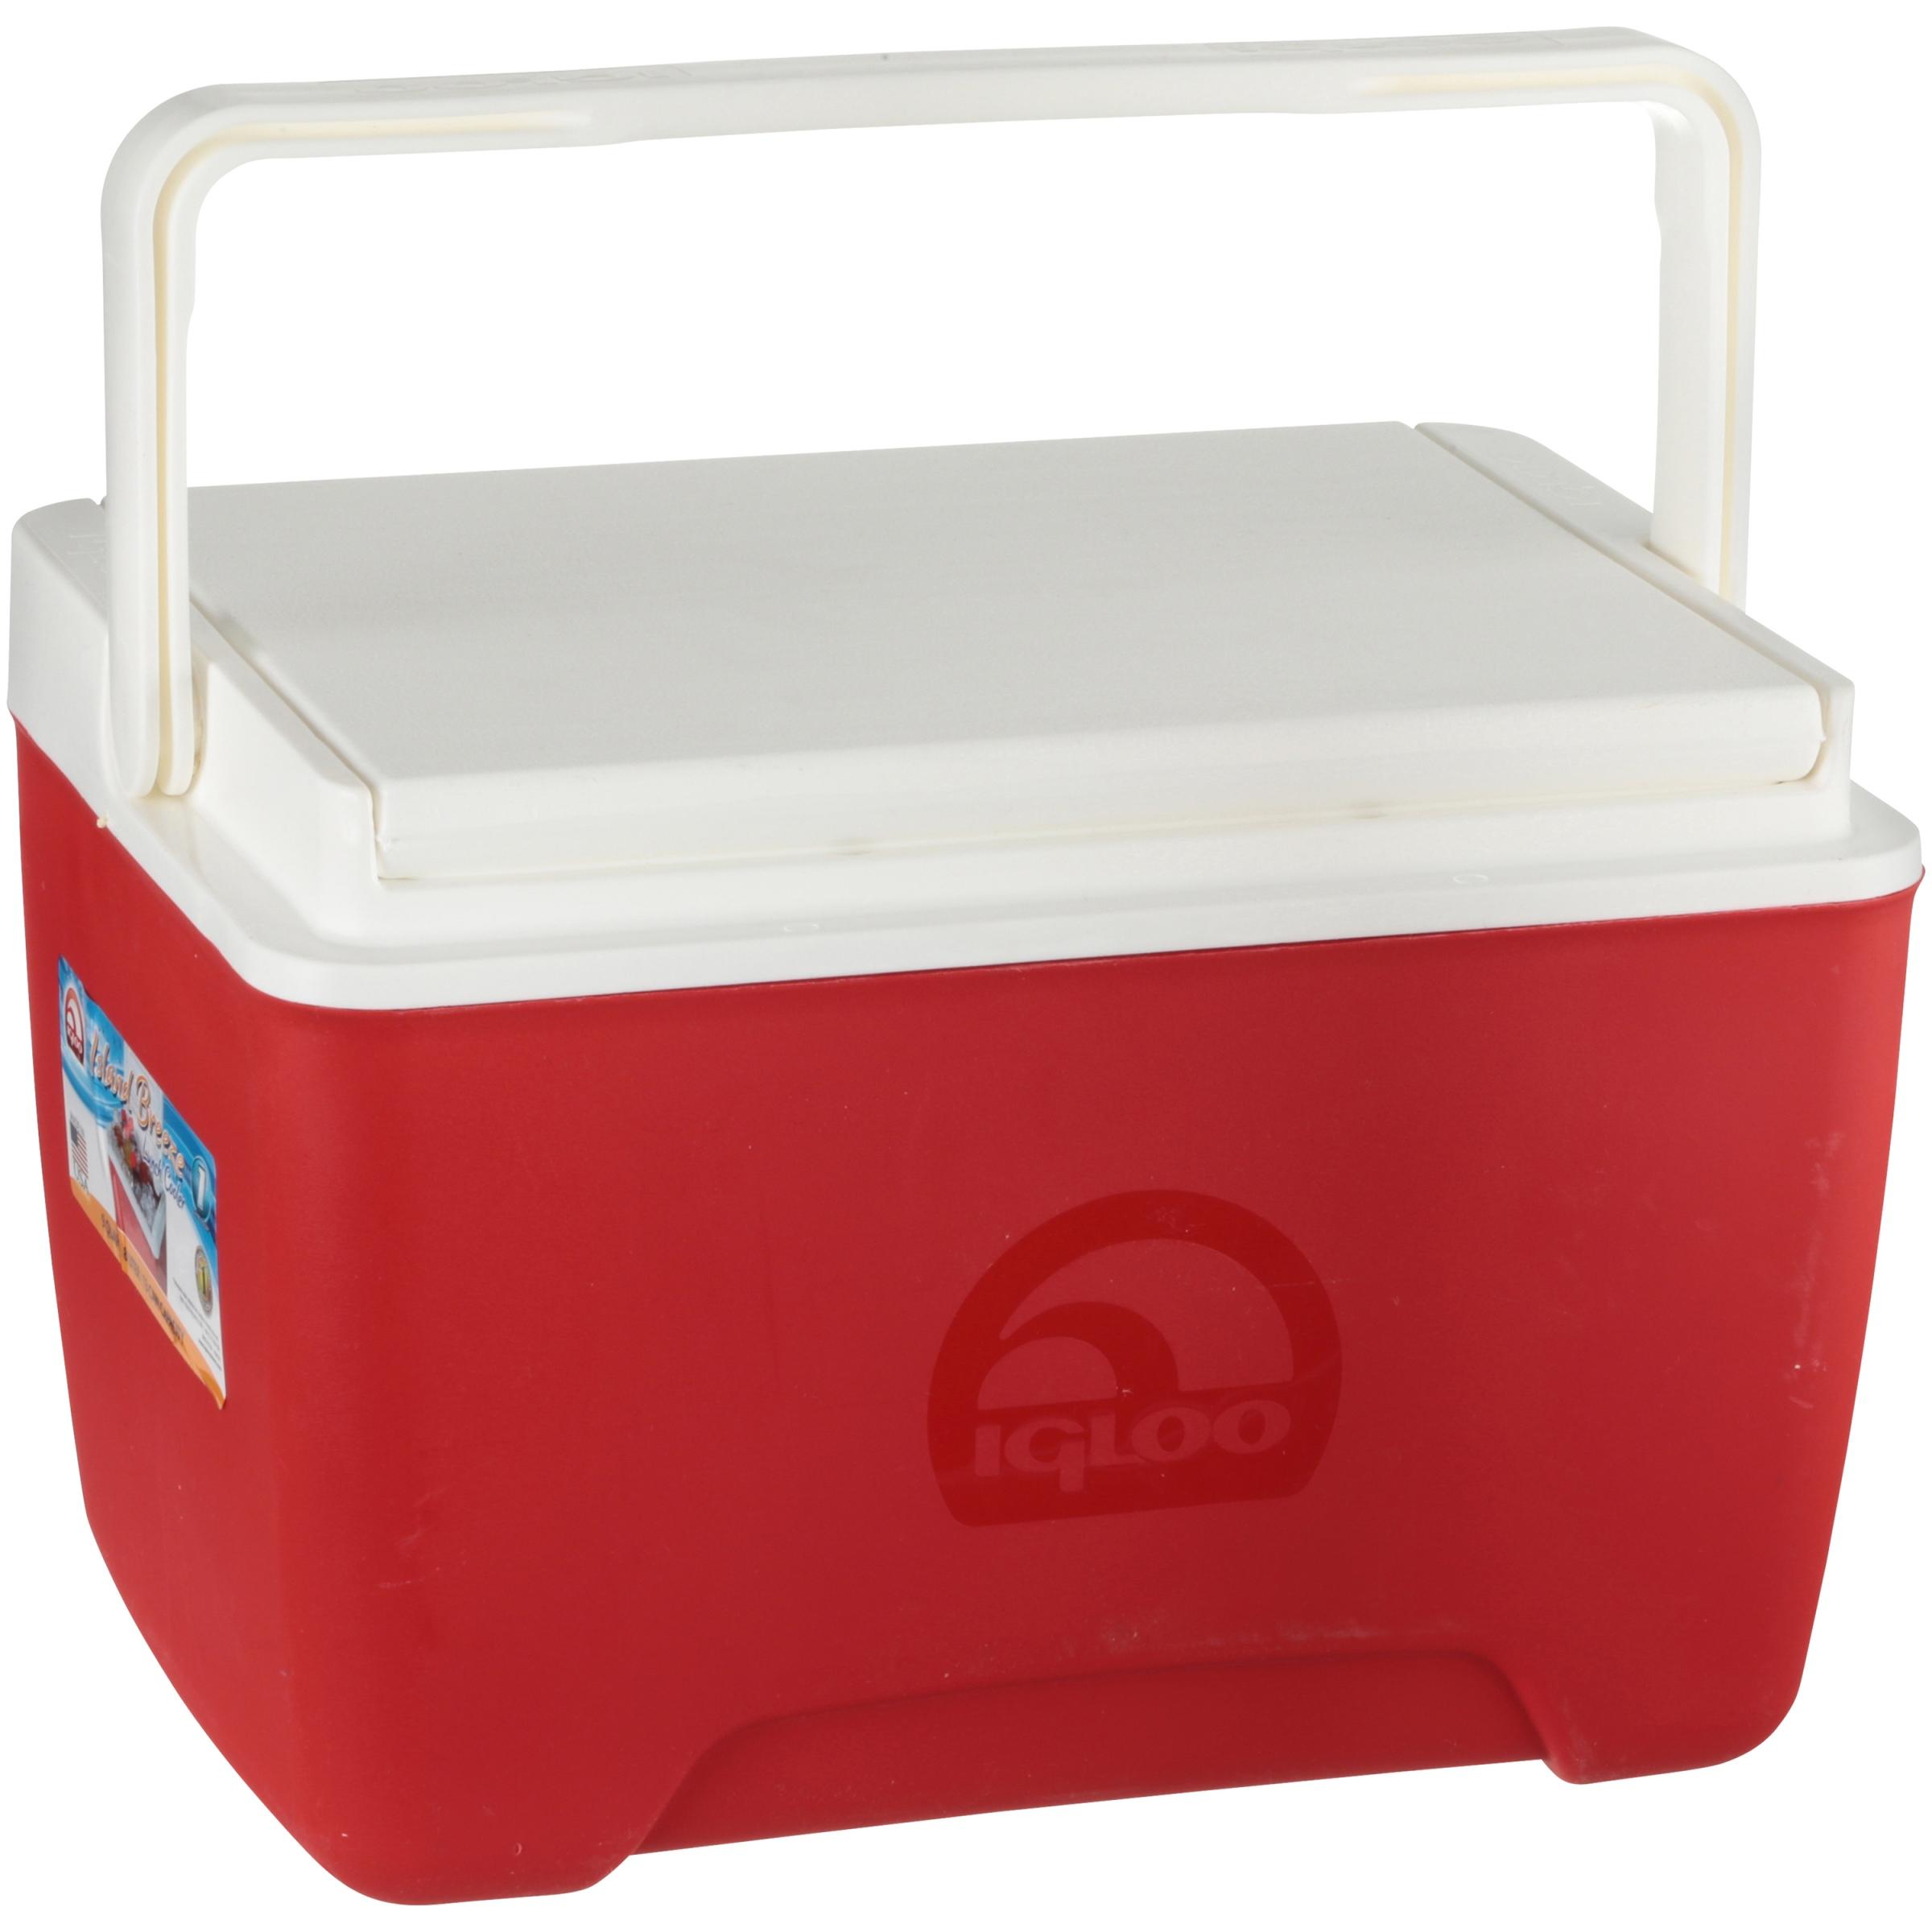 Island Breeze 9-Quart Cooler $9.97  + Free Store Pickup